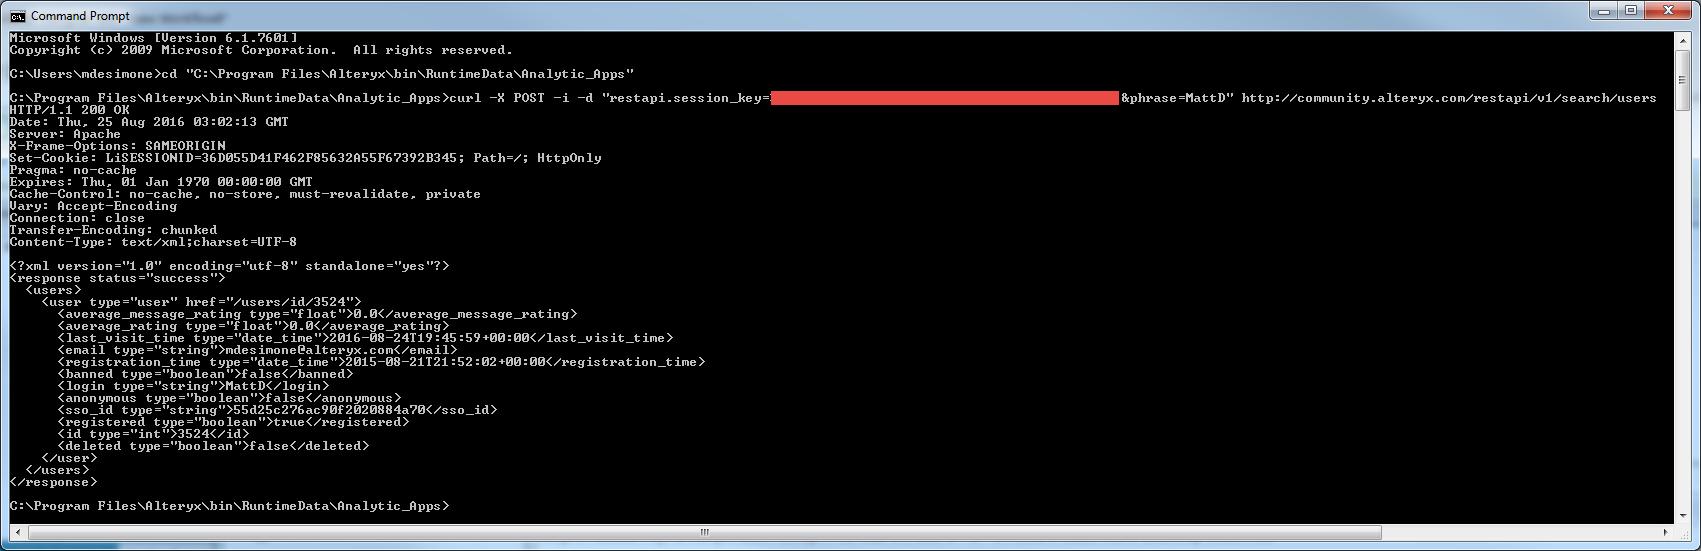 APIs in Alteryx: cURL and Download Tool télécharger herunterladen